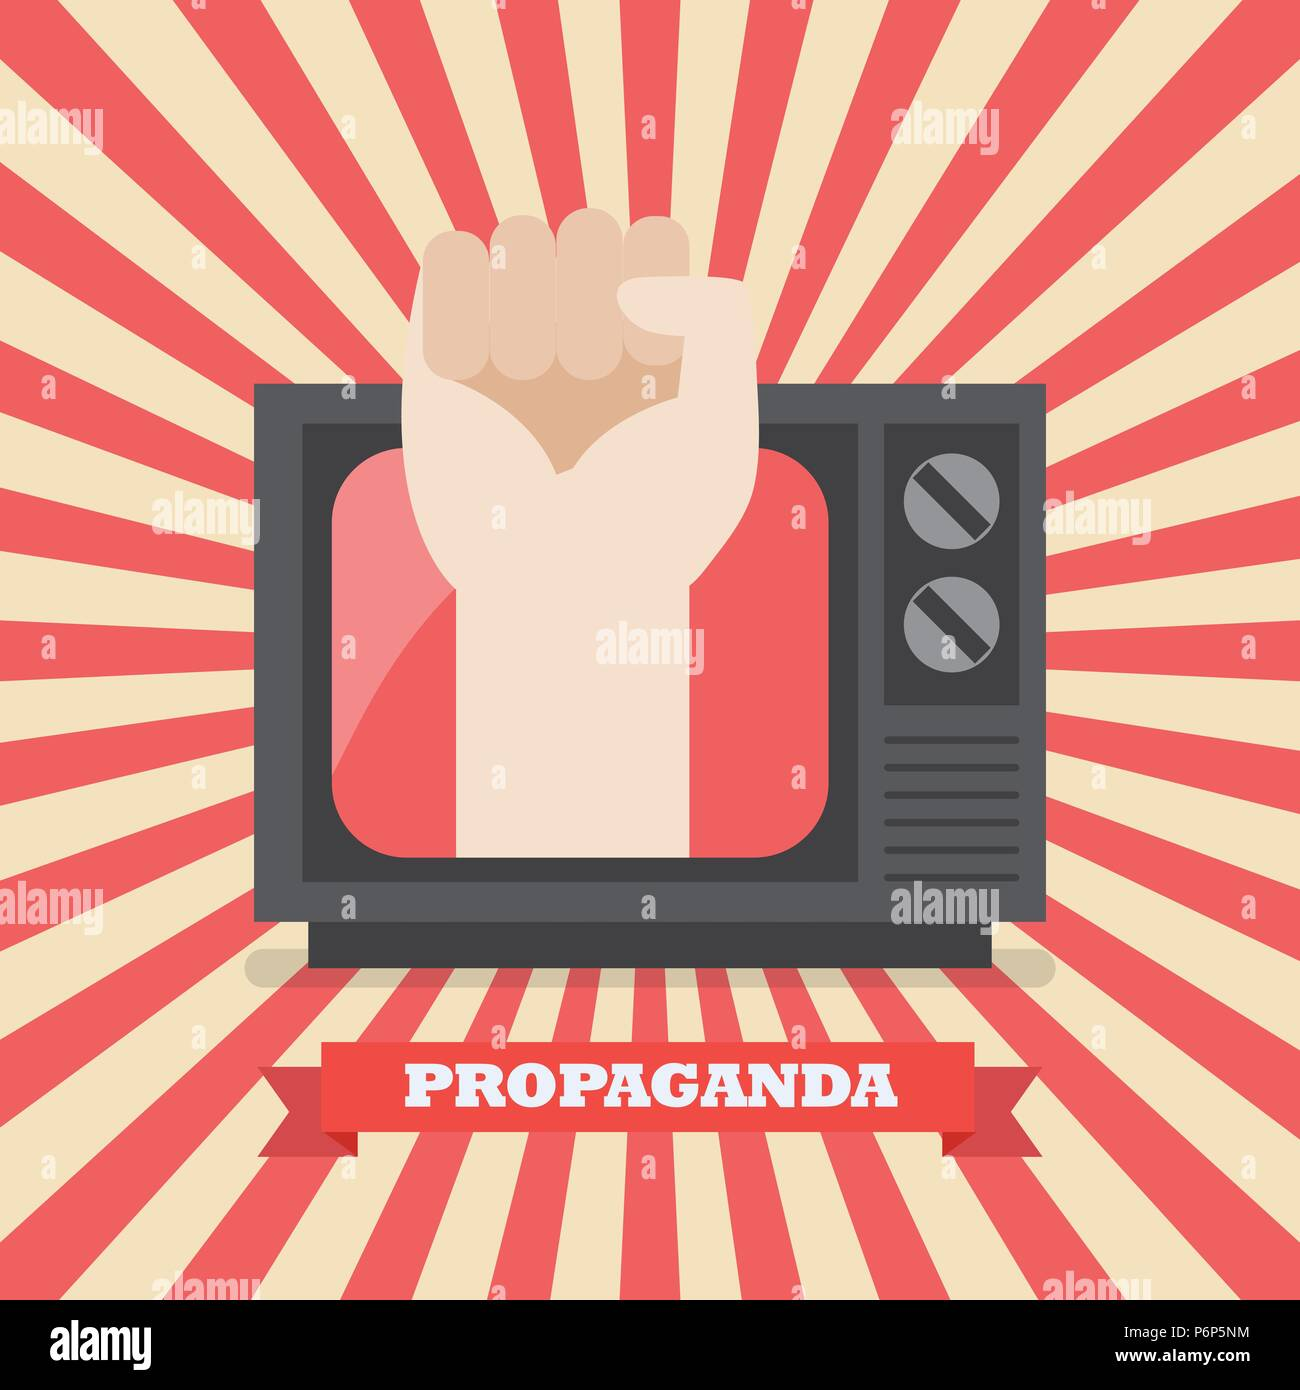 Fist hand in retro television. Television Propaganda Poster Vector illustration - Stock Vector